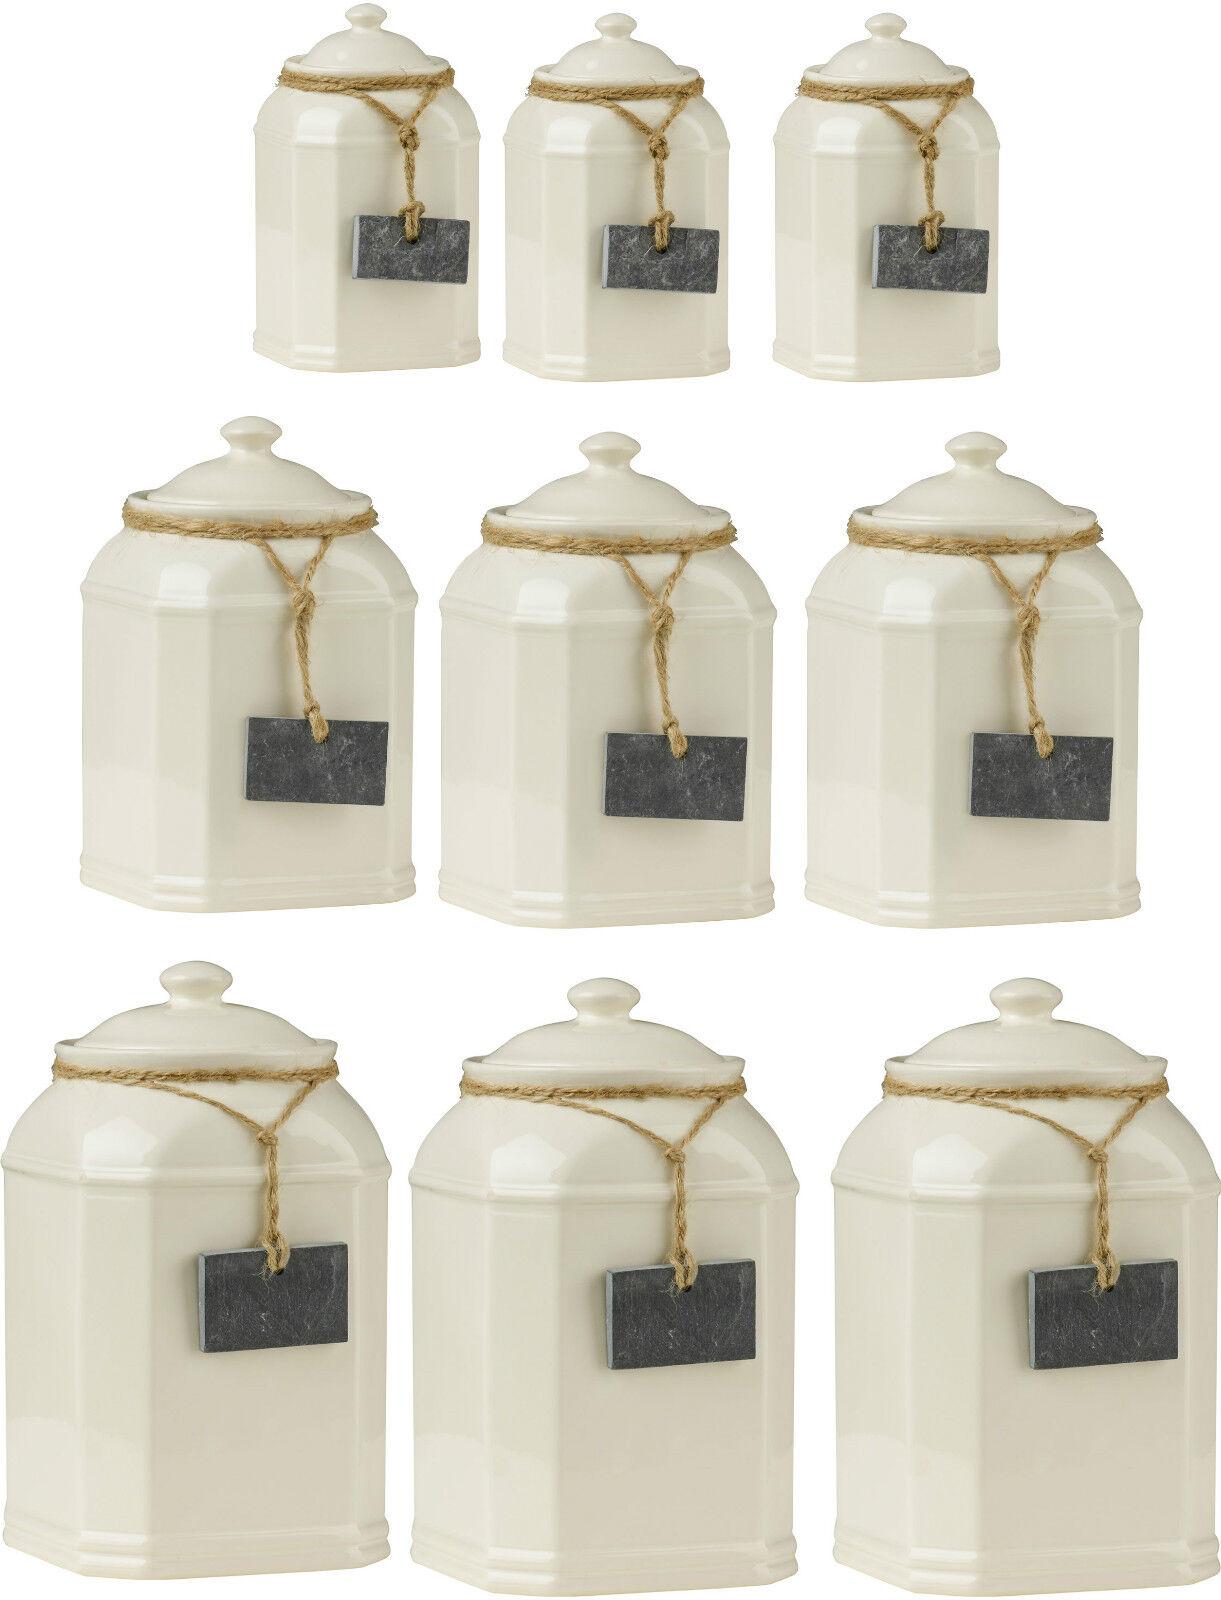 Copper Tea Coffee Sugar Canisters Storage Jars Tea Coffee Sugar